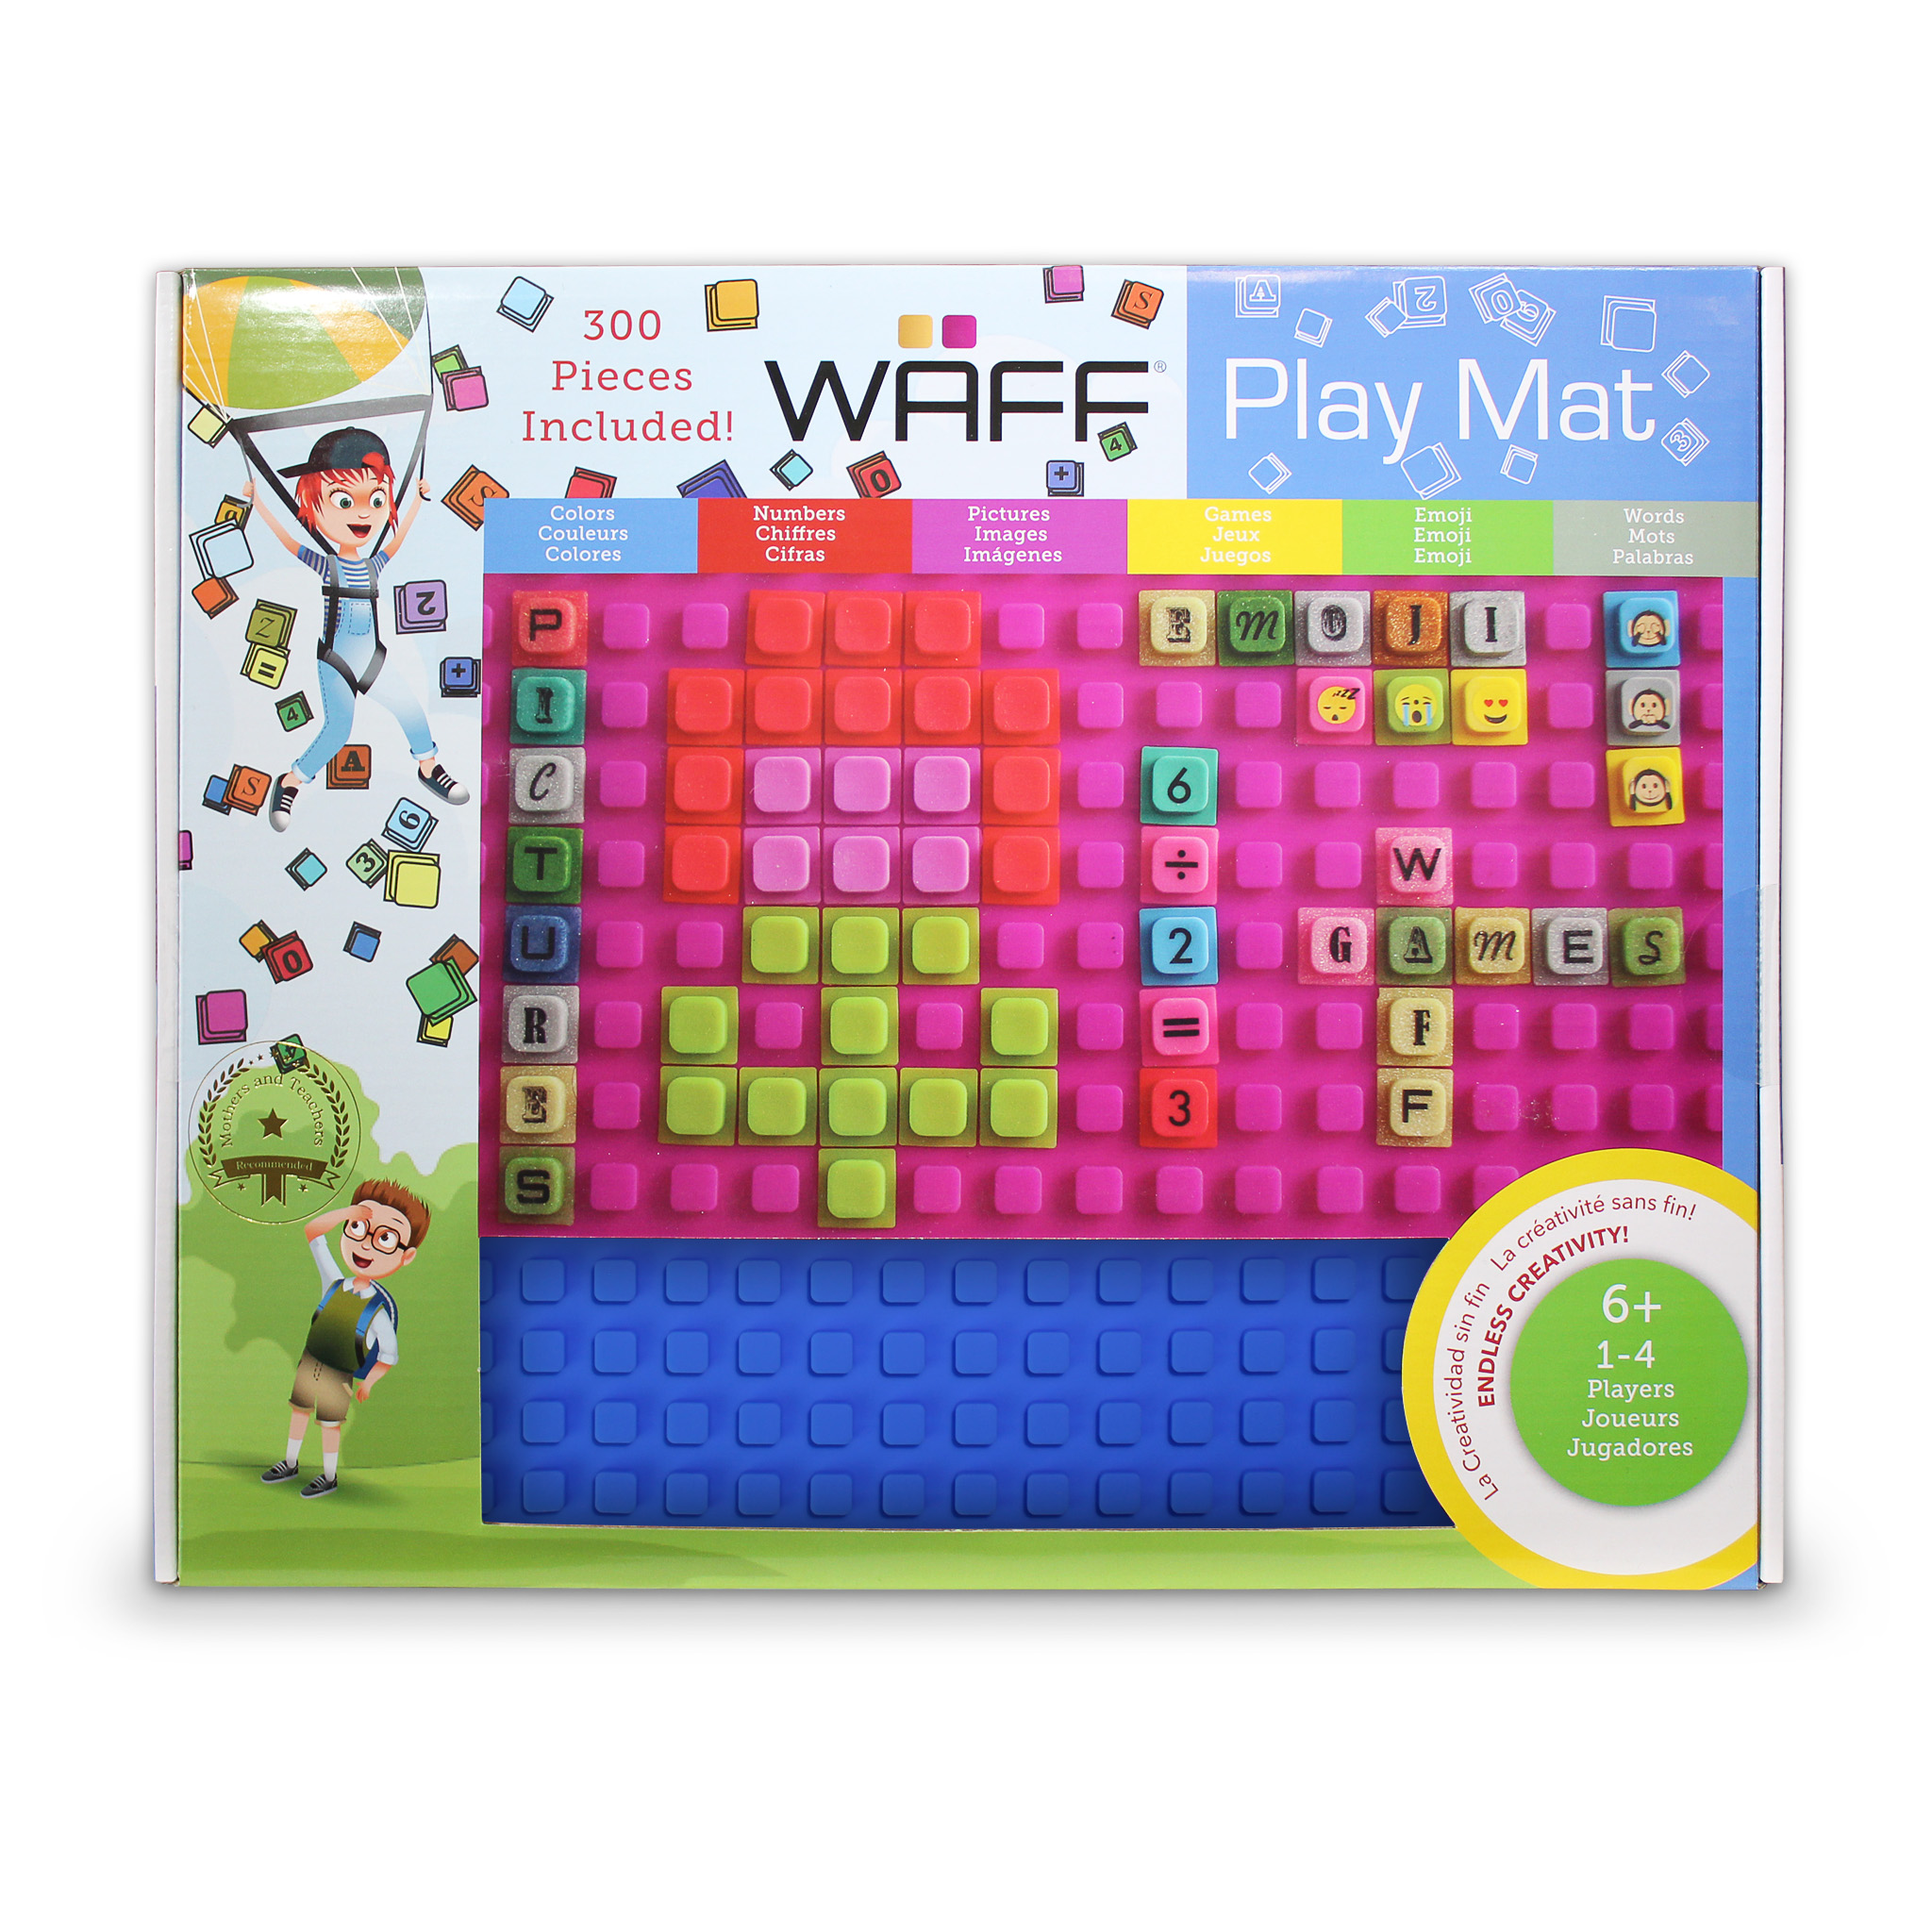 WAFF Playmat - Blue